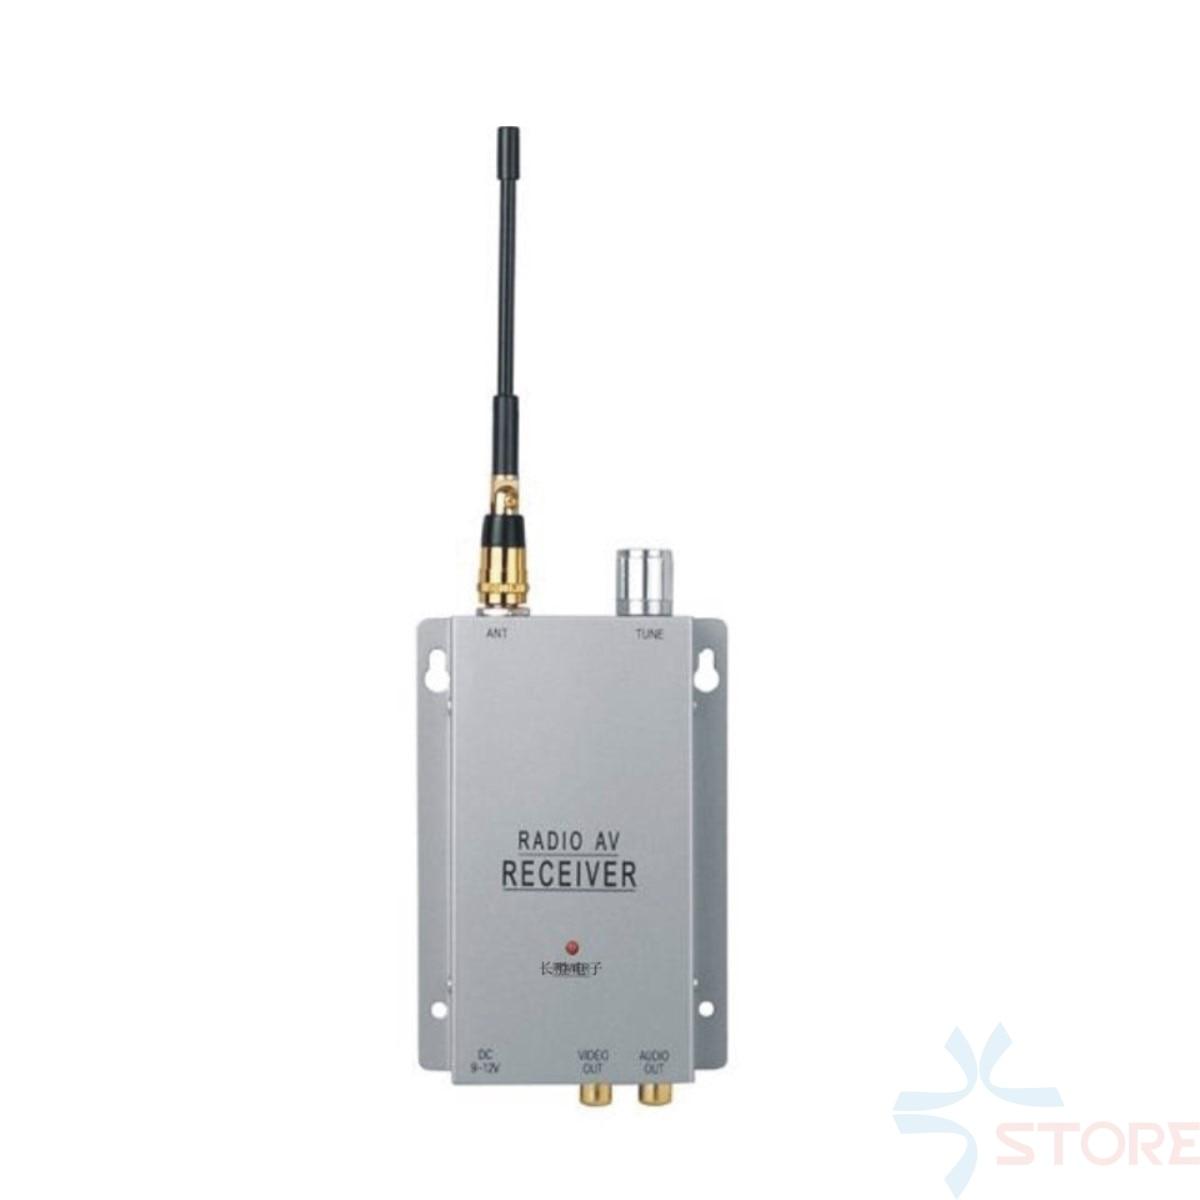 1.2G 4Ch Wireless camera AV receiver wireless 1.2G transceiver For CCTV Camera FPV Monitor 1 2g 100mw wireless audio video transceiver and receiver combo for fpv